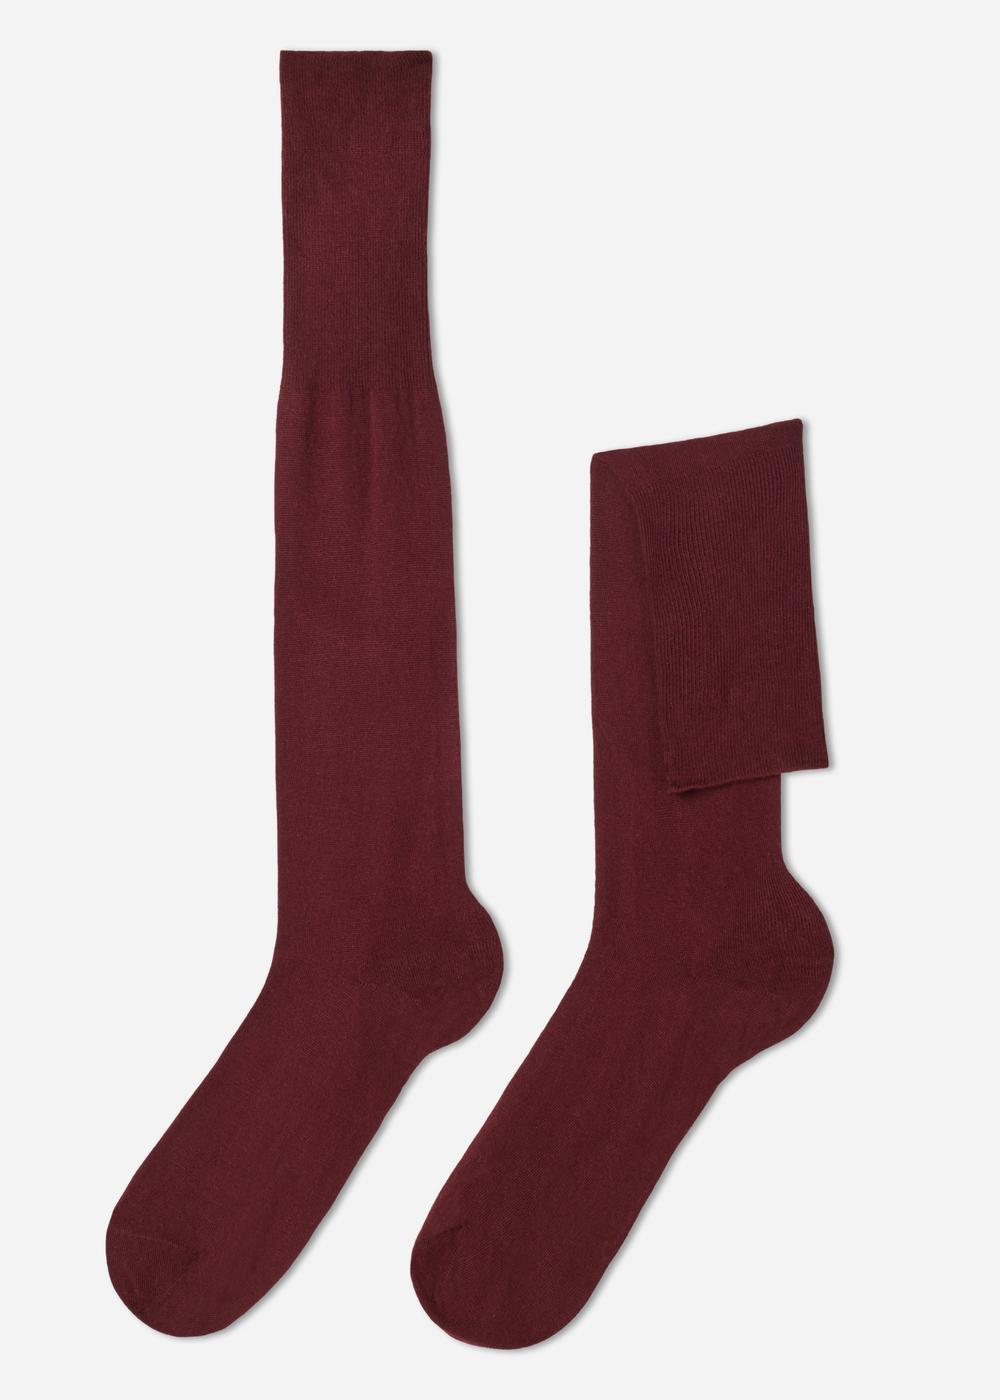 Calcetines largos con cashmere